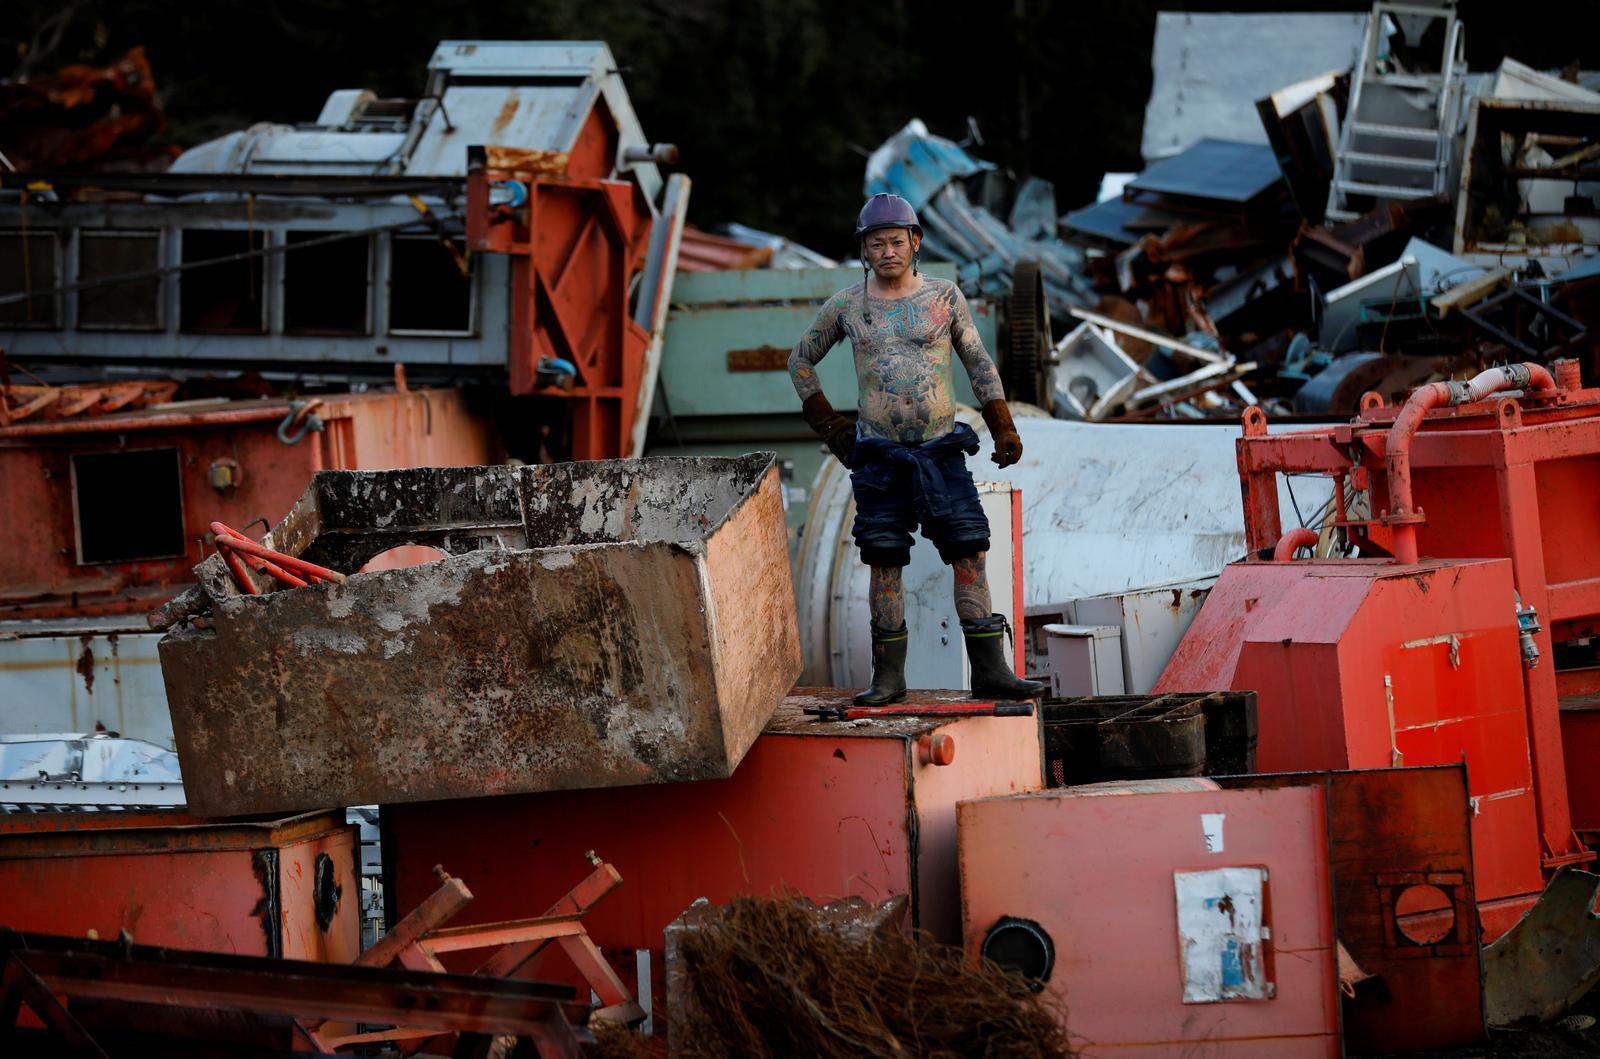 Scrap yard worker Hiroyuki Nemoto, 48, poses at the scrap yard where he works in Hitachinaka, Ibaraki Prefecture, Japan, January 10, 2020. Photo: Reuters